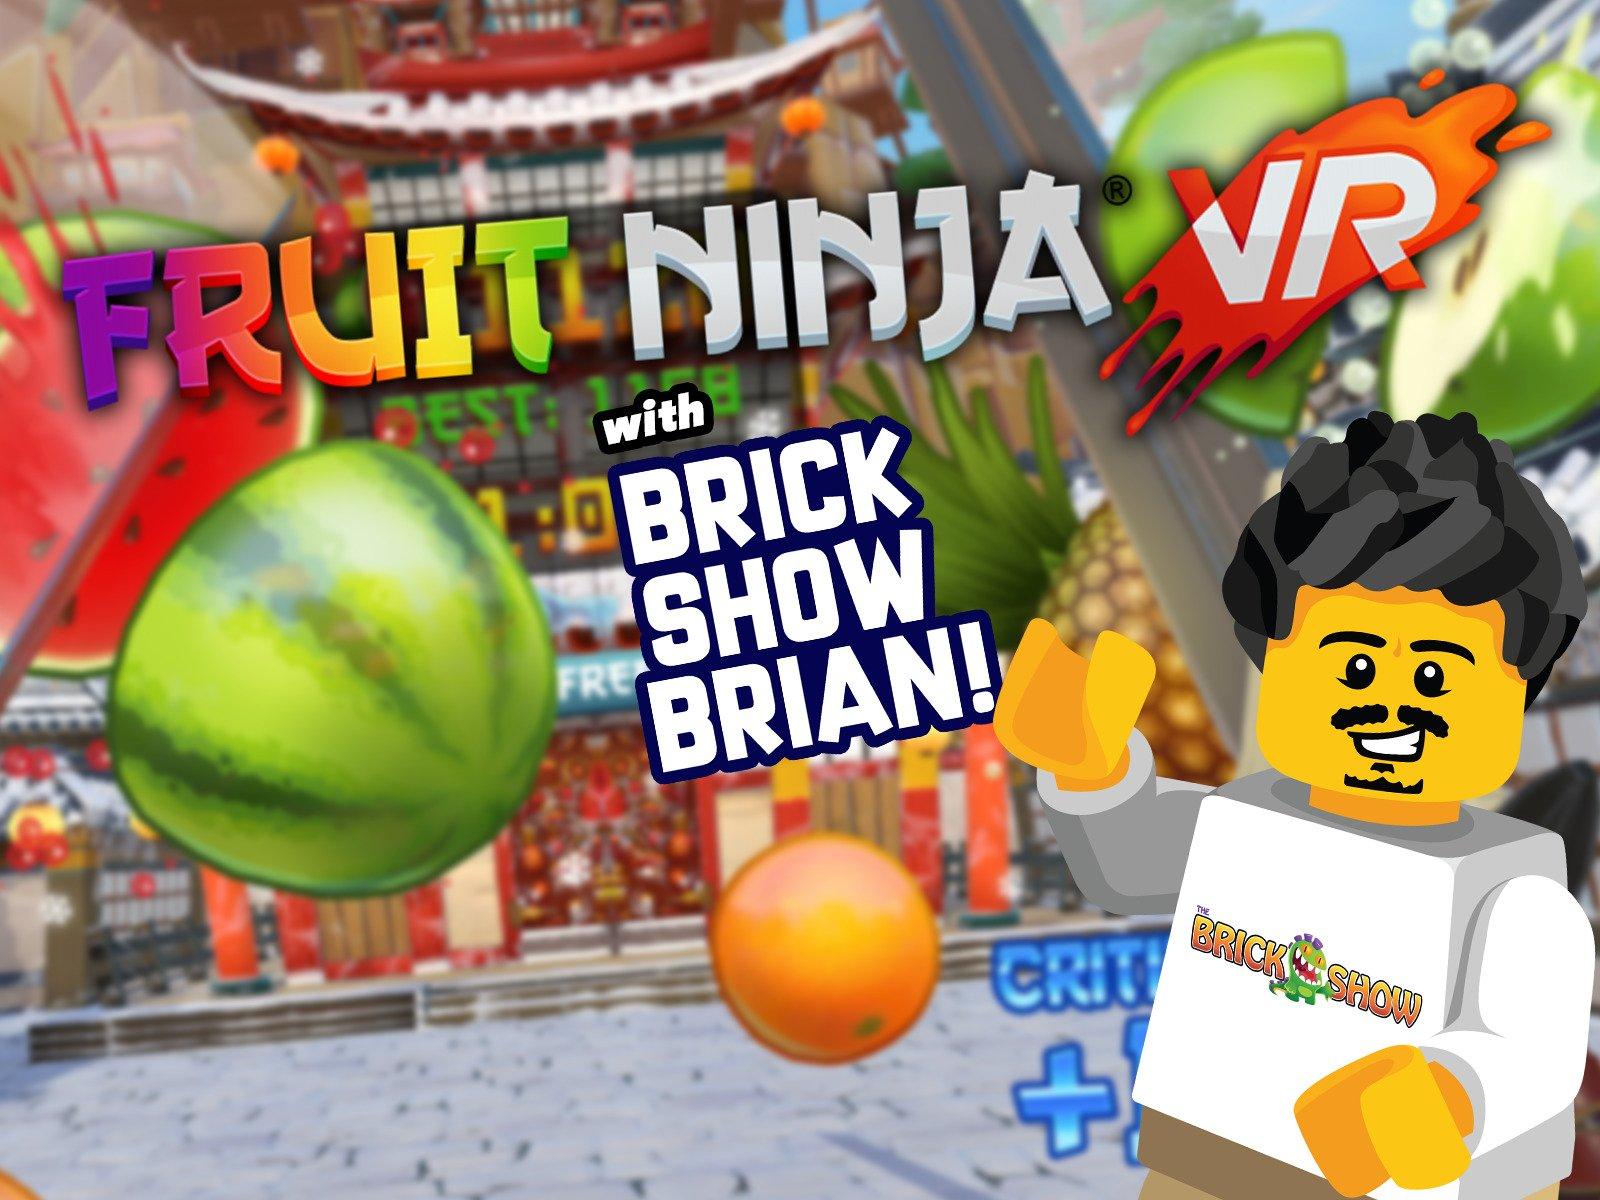 Clip: Fruit Ninja VR with Brick Show Brian - Season 1